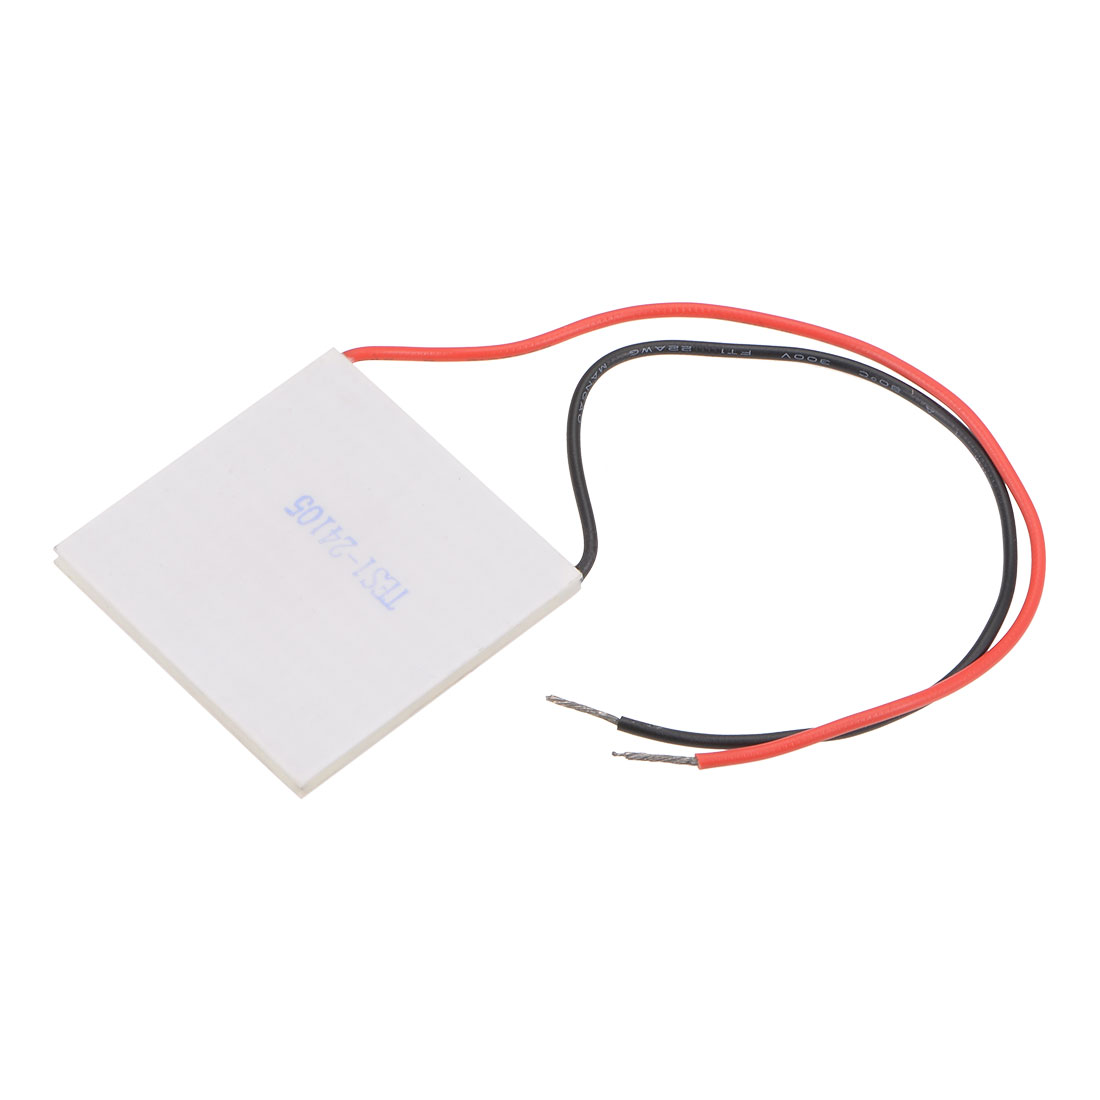 TESL-24105 Thermoelectric Cooler Heat Sink Cooling Peltier 24V 5A